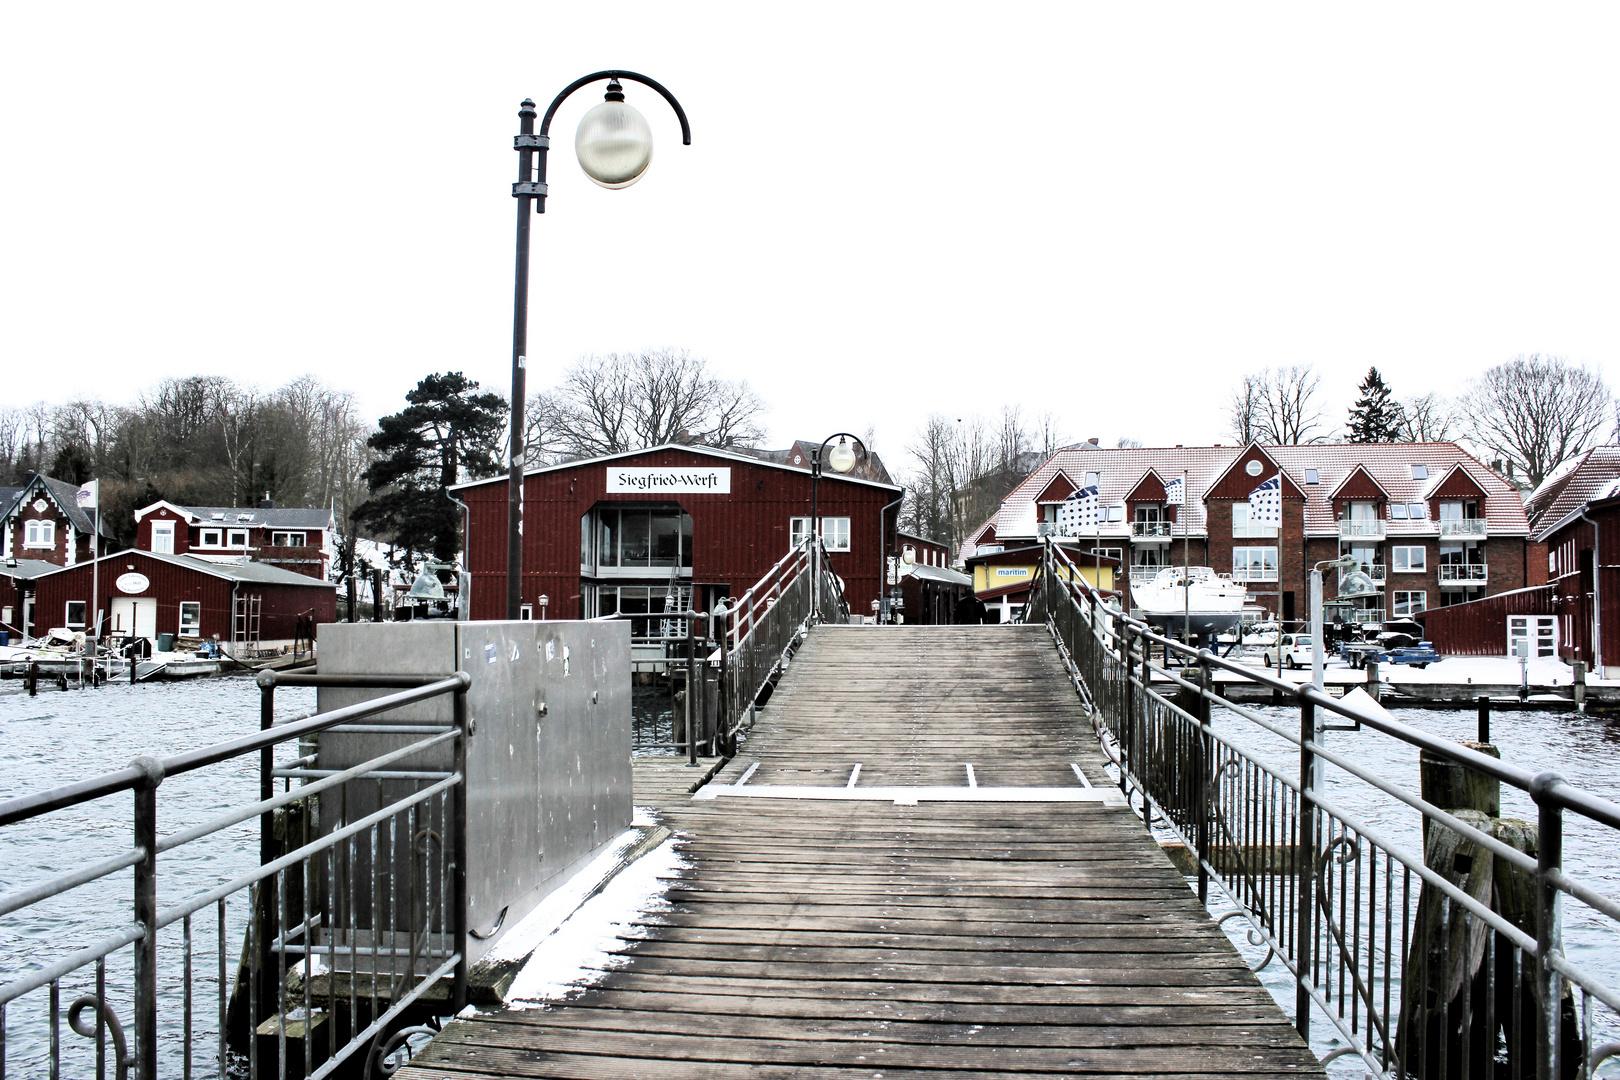 Eckernförde